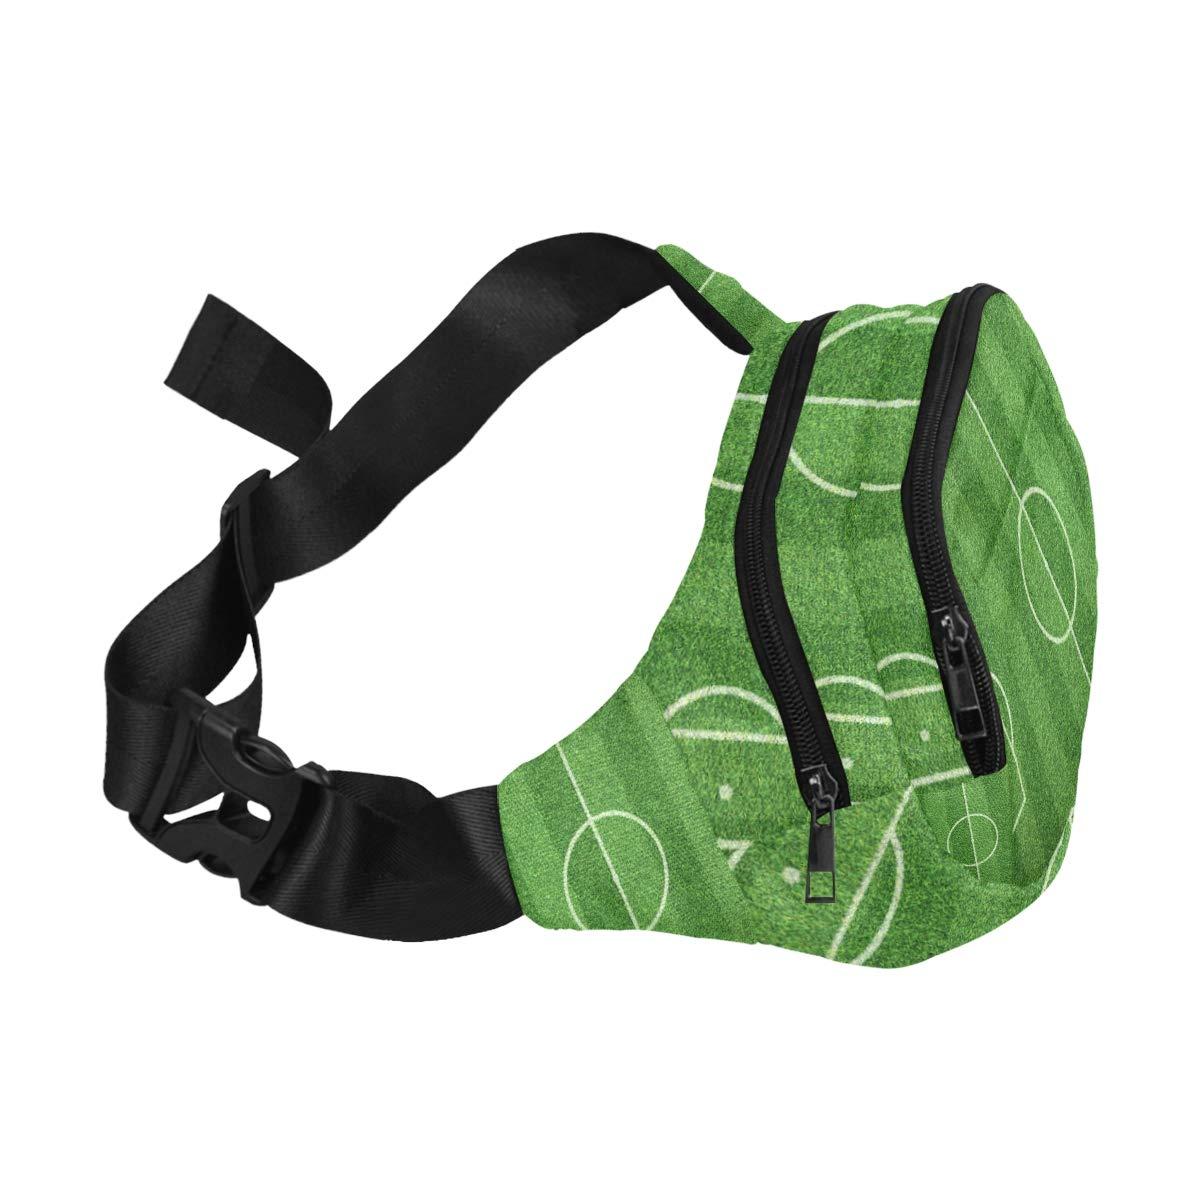 Soccer Field Football Field Fenny Packs Waist Bags Adjustable Belt Waterproof Nylon Travel Running Sport Vacation Party For Men Women Boys Girls Kids